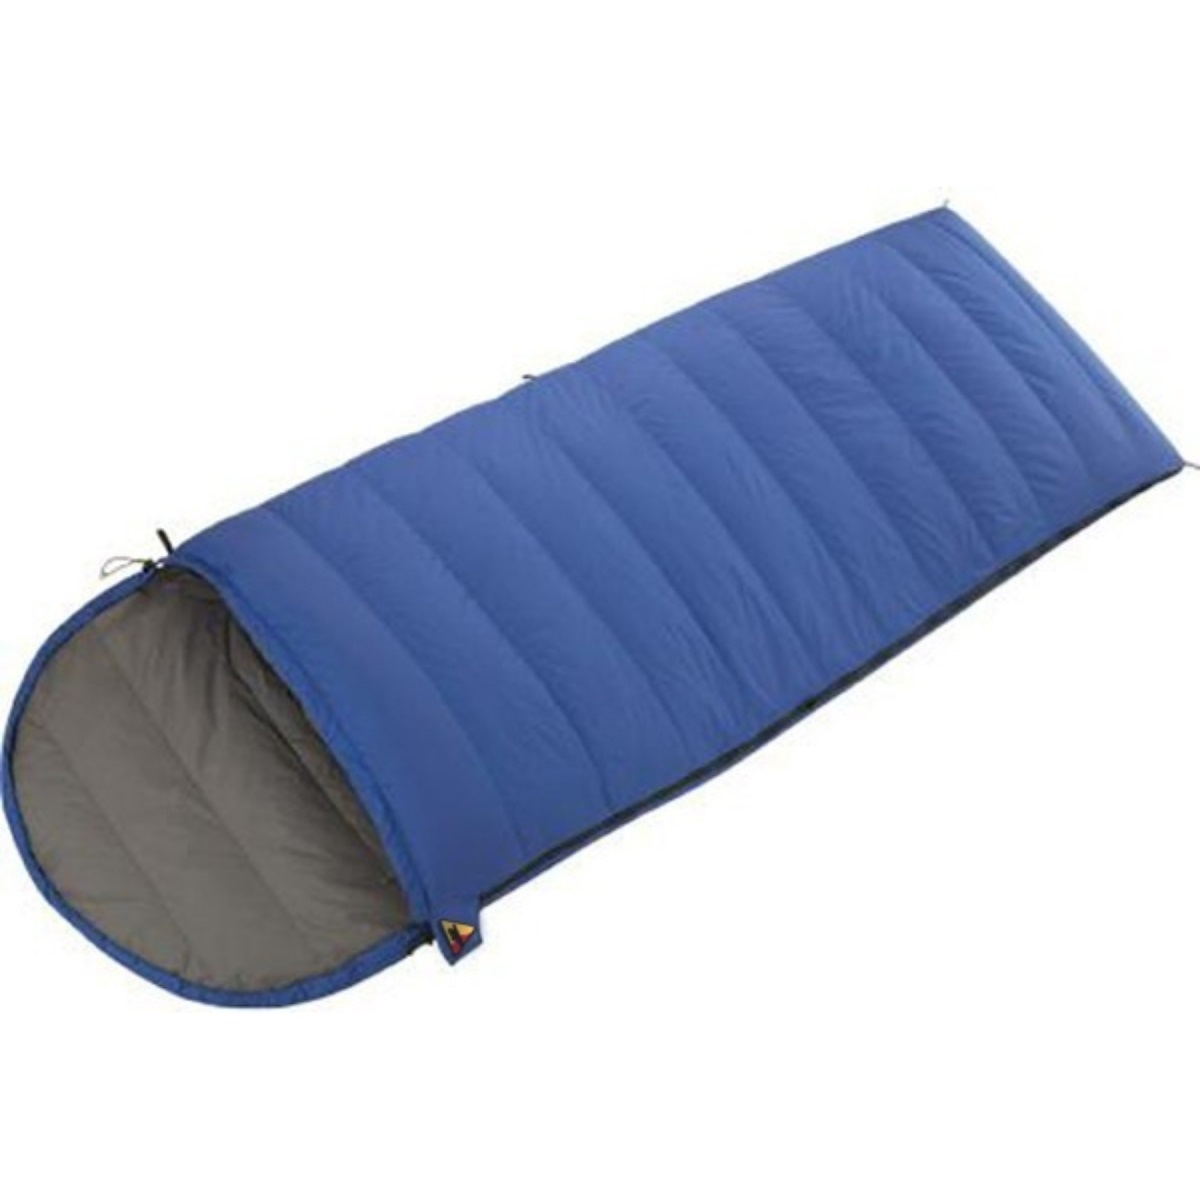 Спальный мешок bask blanket pro v2 m 3540